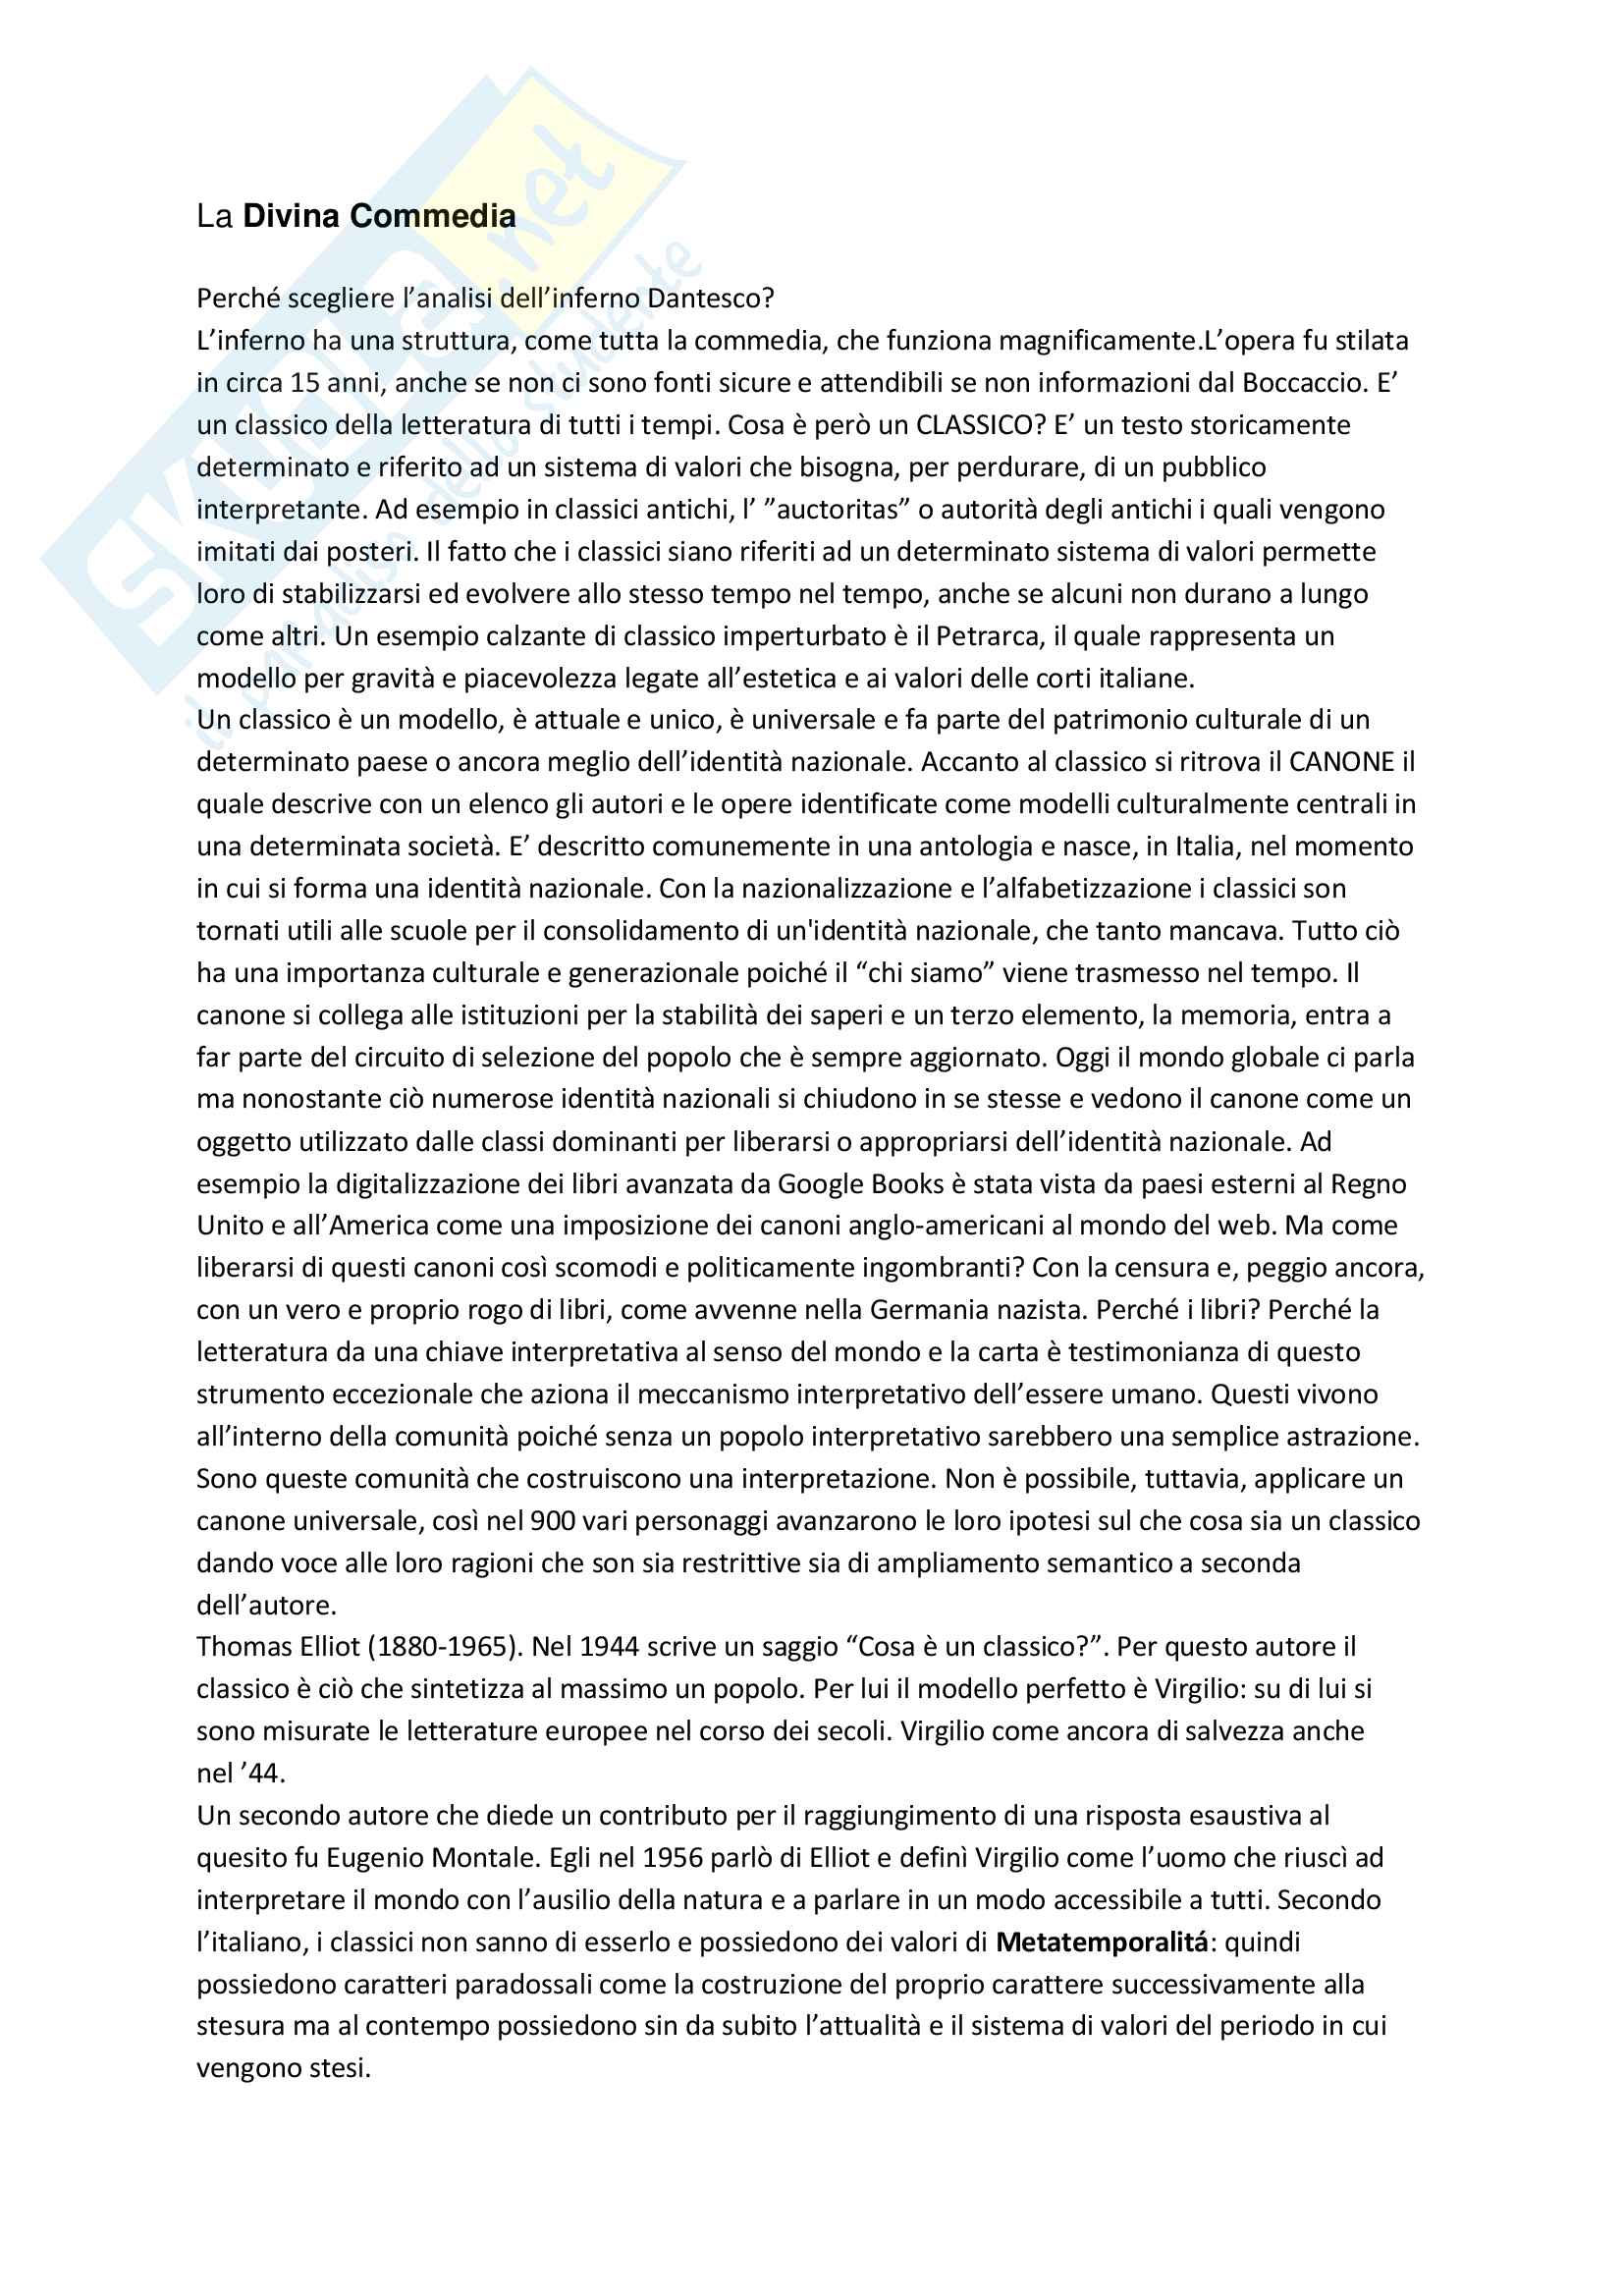 Divina Commedia Dante Alighieri e Canto I, II e III